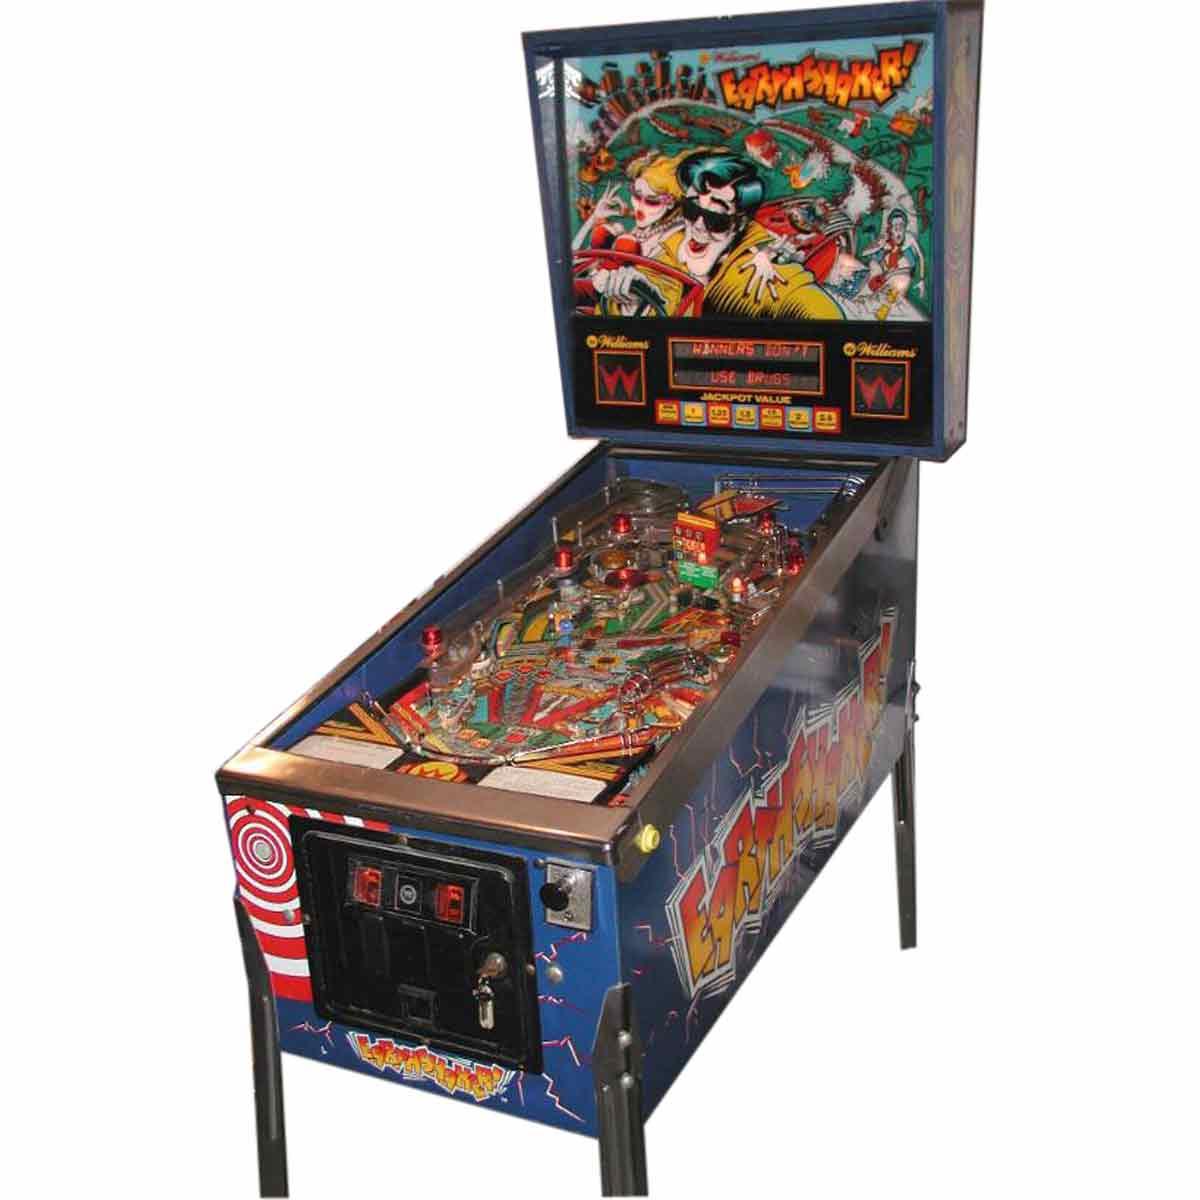 How To Buy Arcade Machines